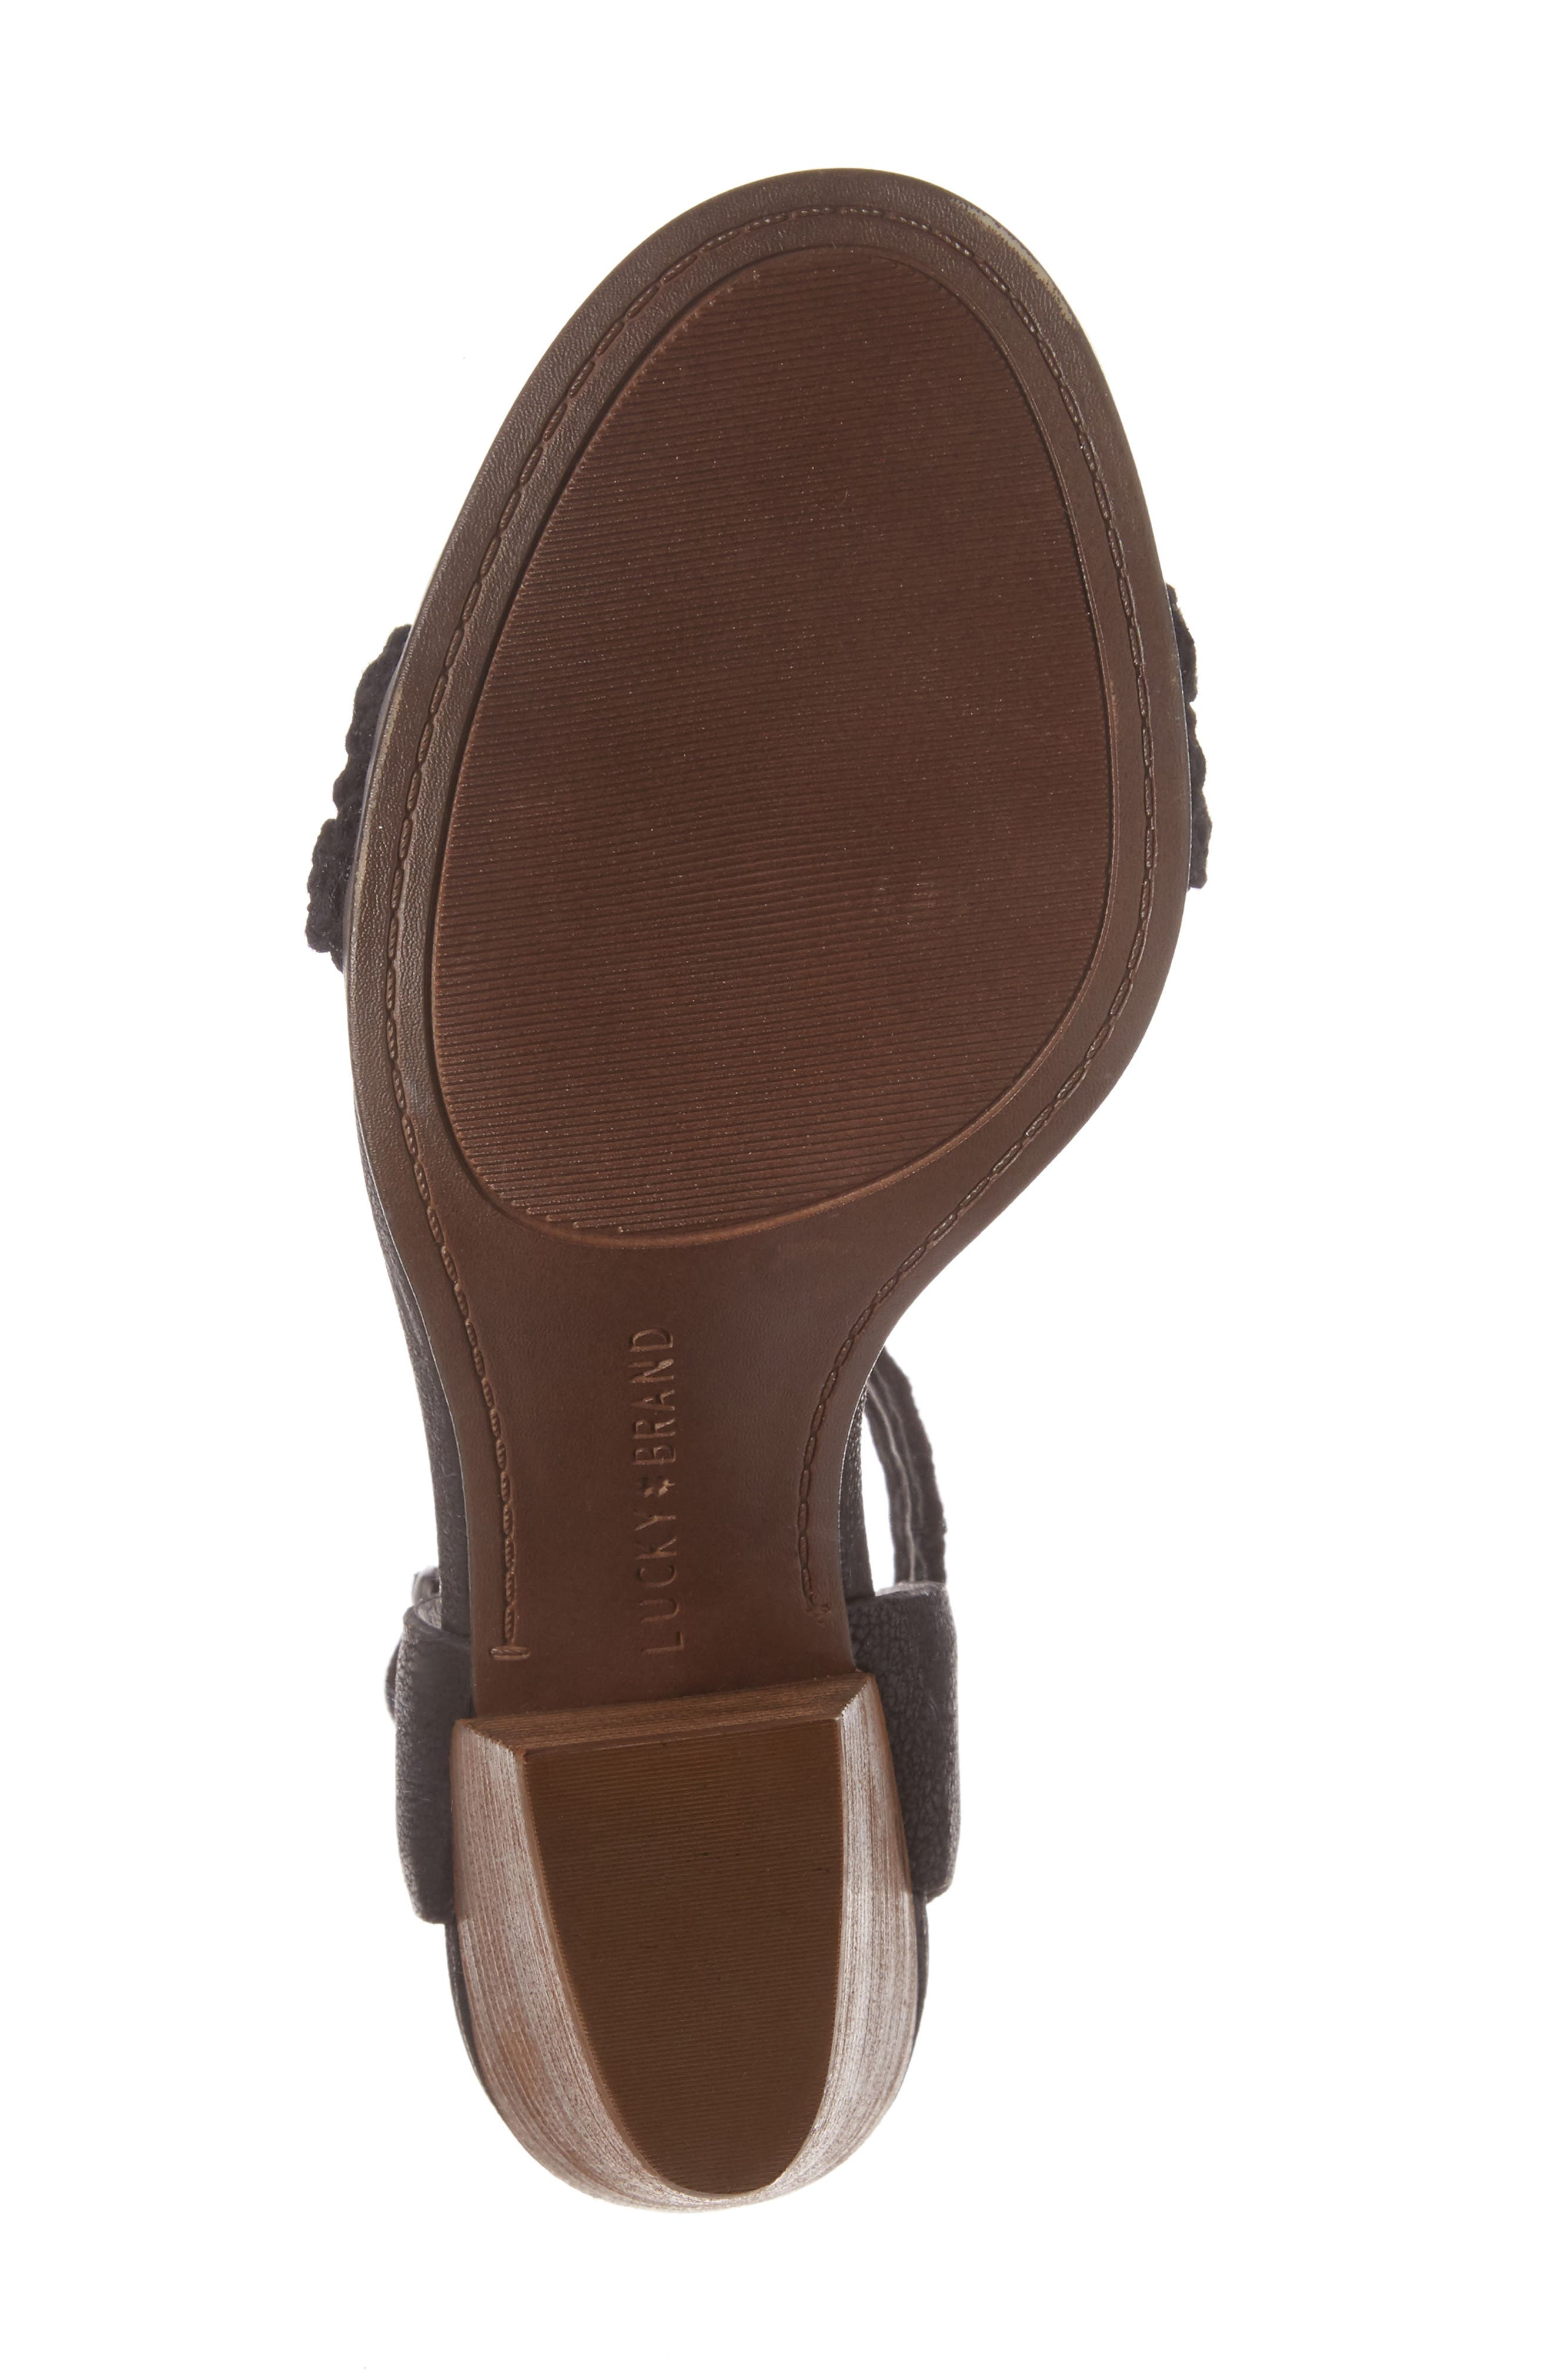 Oakes Ankle Strap Sandal,                             Alternate thumbnail 6, color,                             001